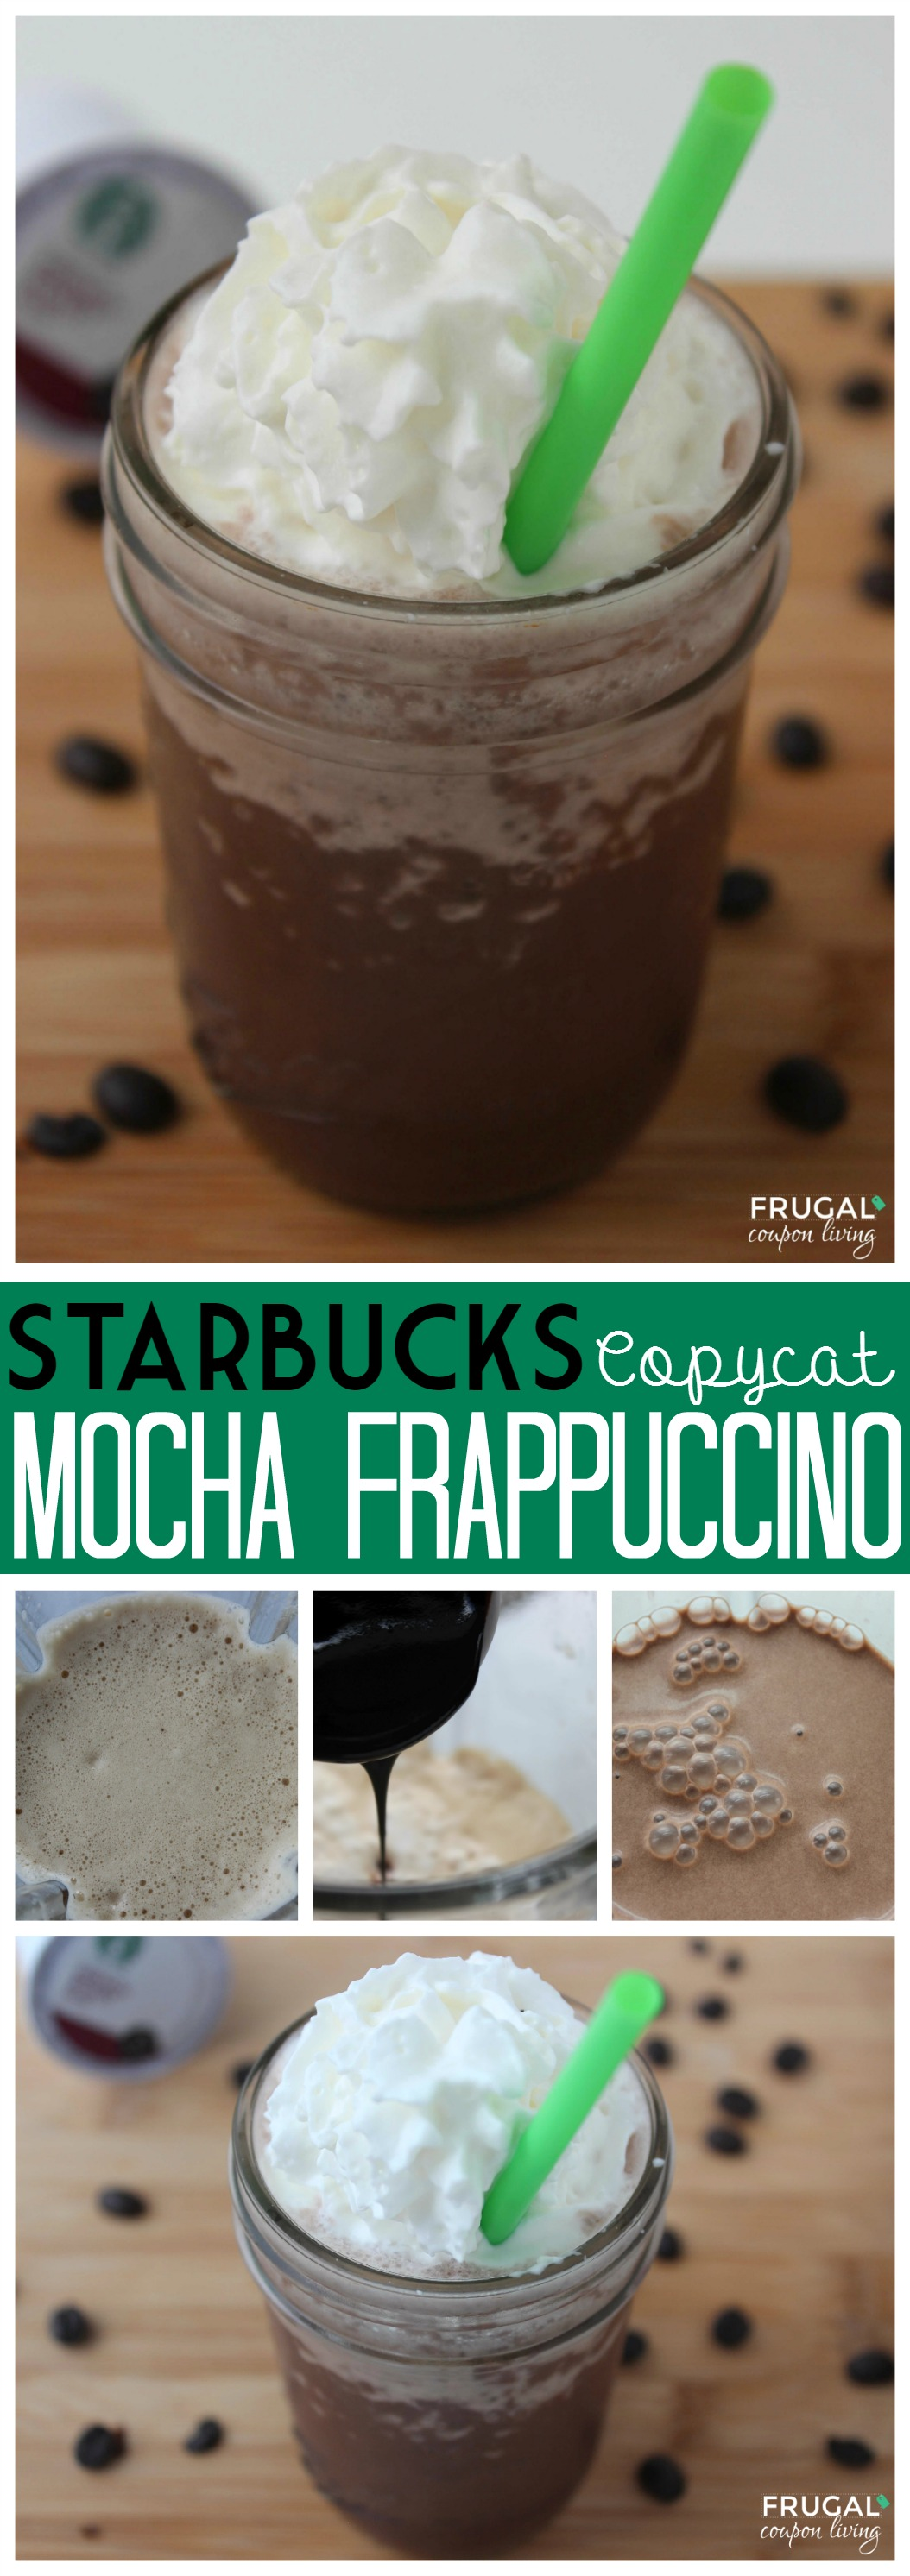 copycat-starbucks-mocha-frappuccino-Collage